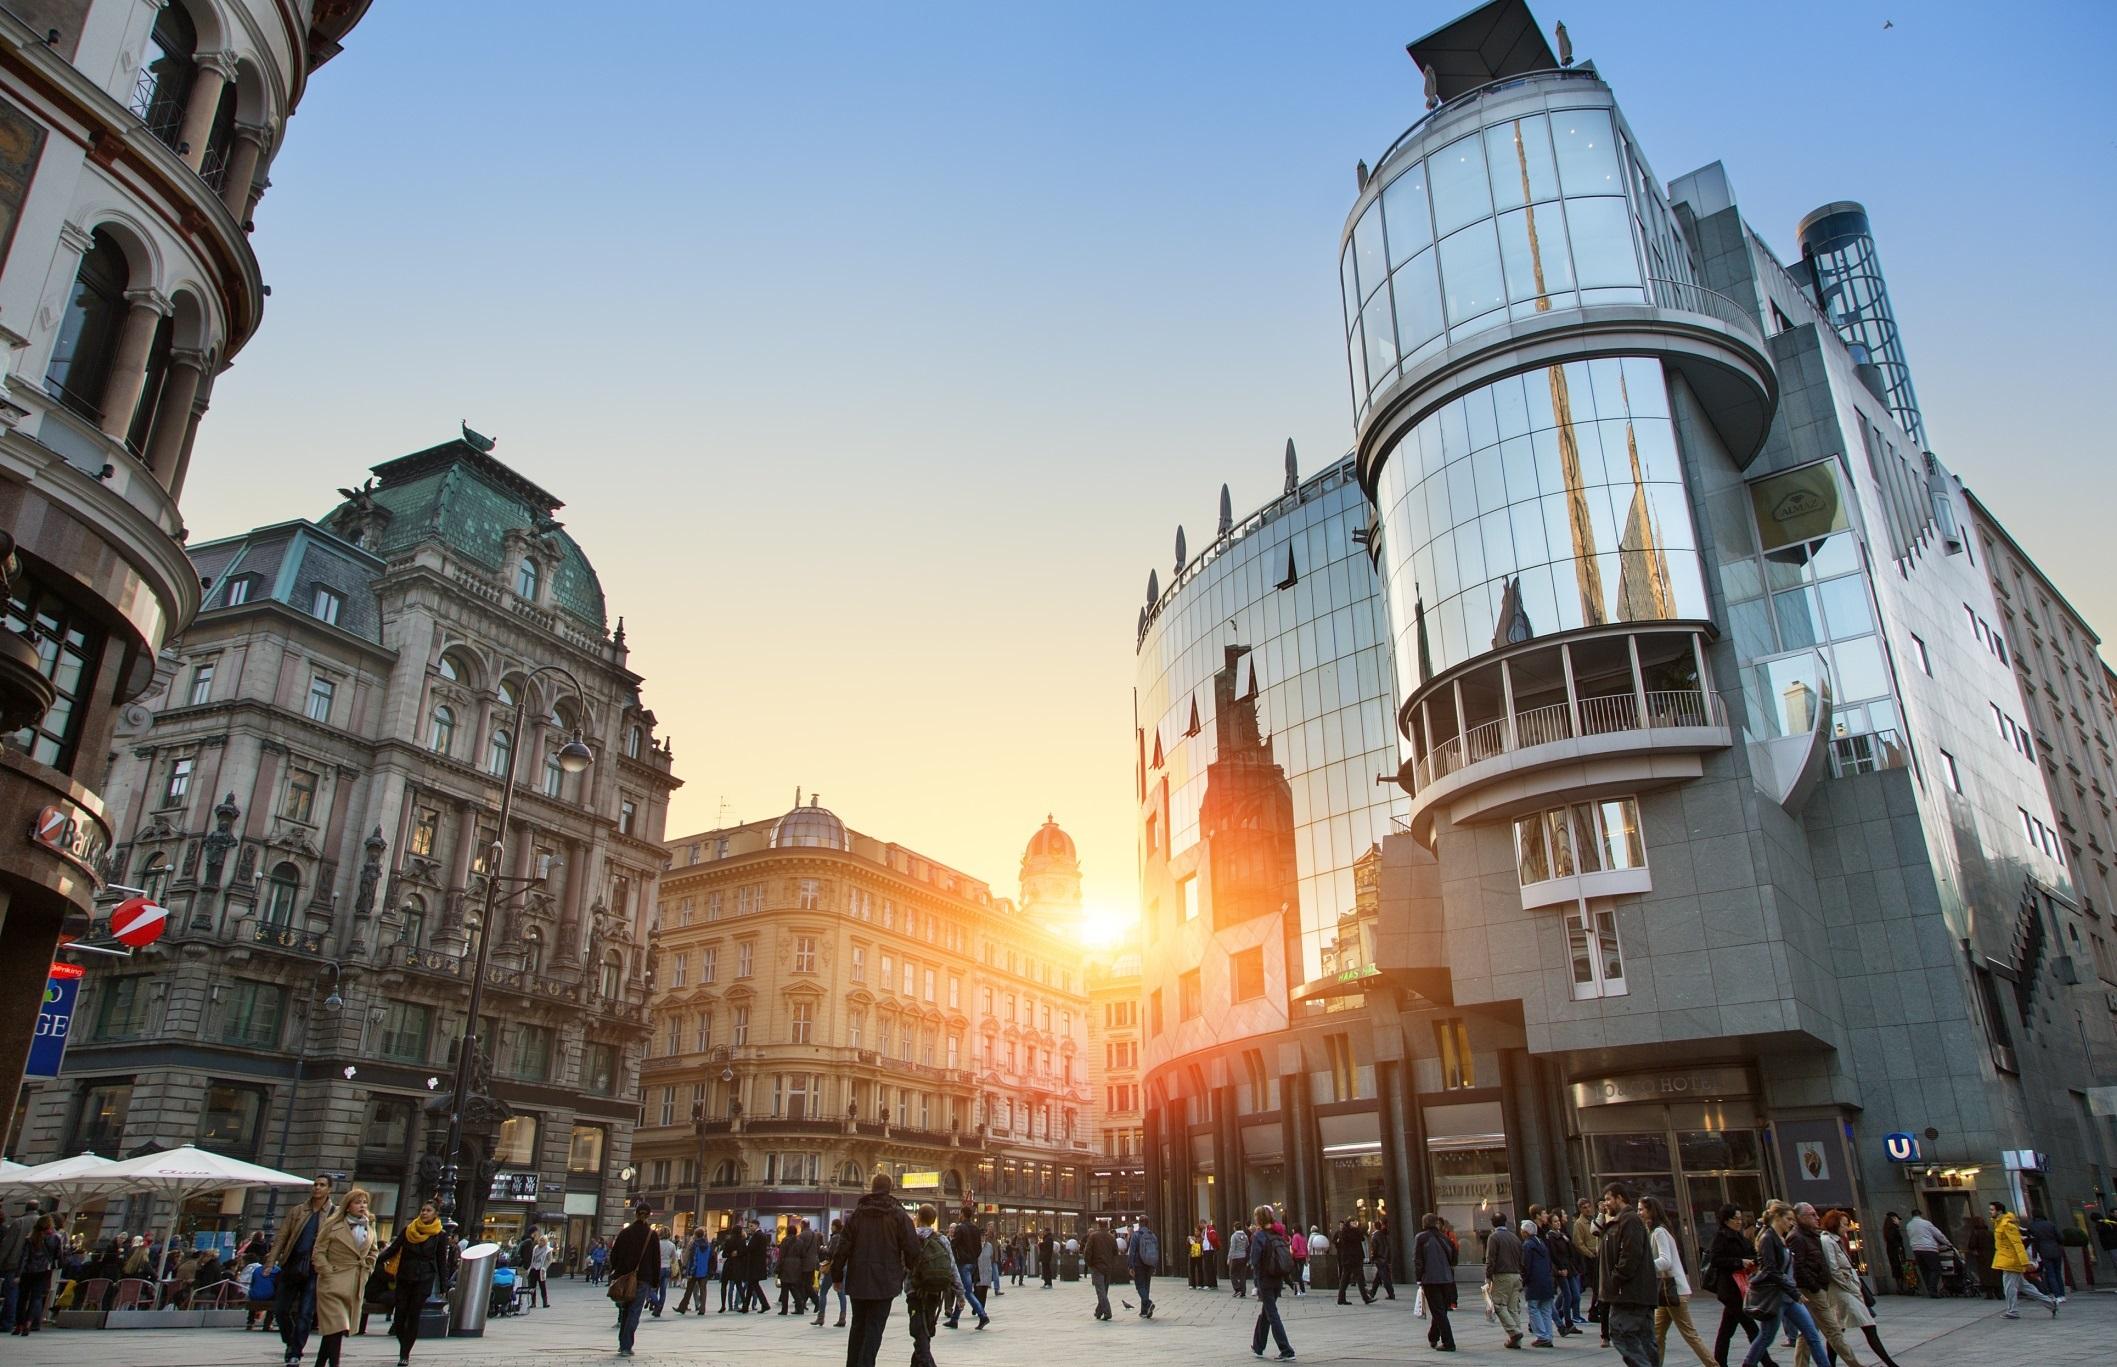 EXTENDED WEEKEND IN VIENNA